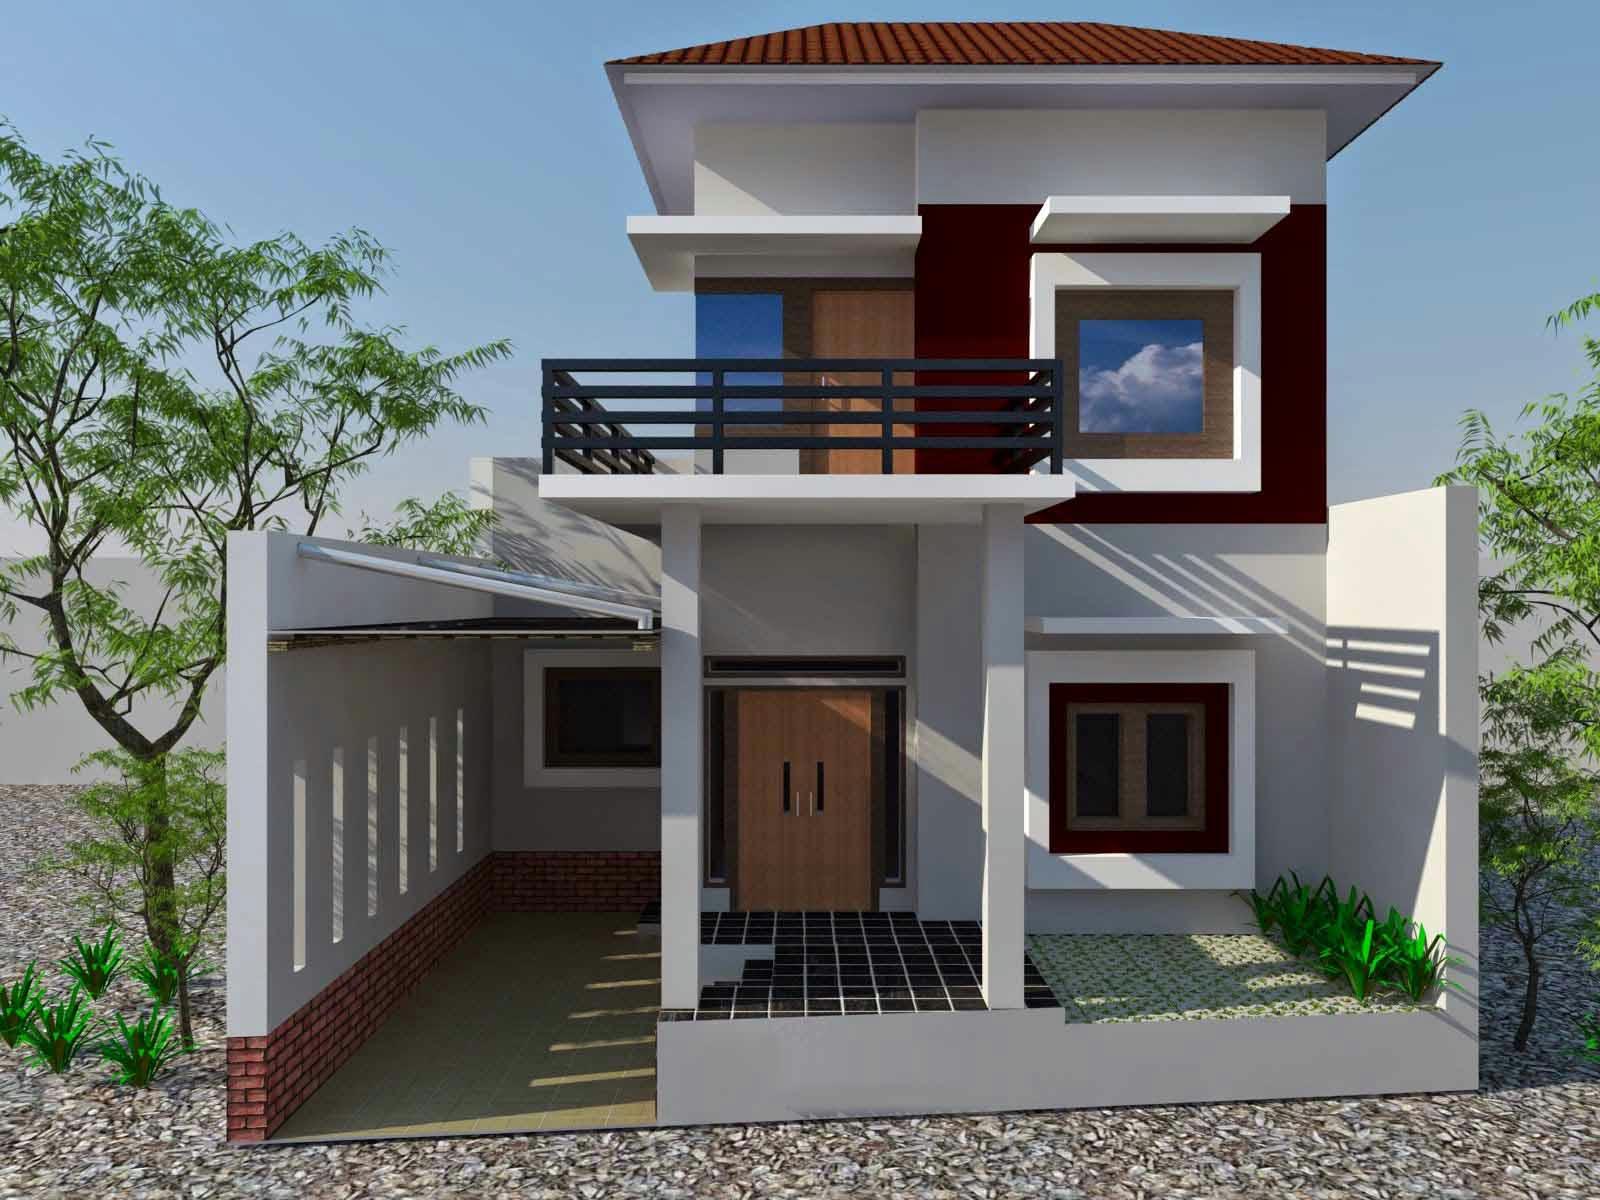 Contoh Gambar Rumah Minimalis Modern 2 Lantai Terbaru Creo House